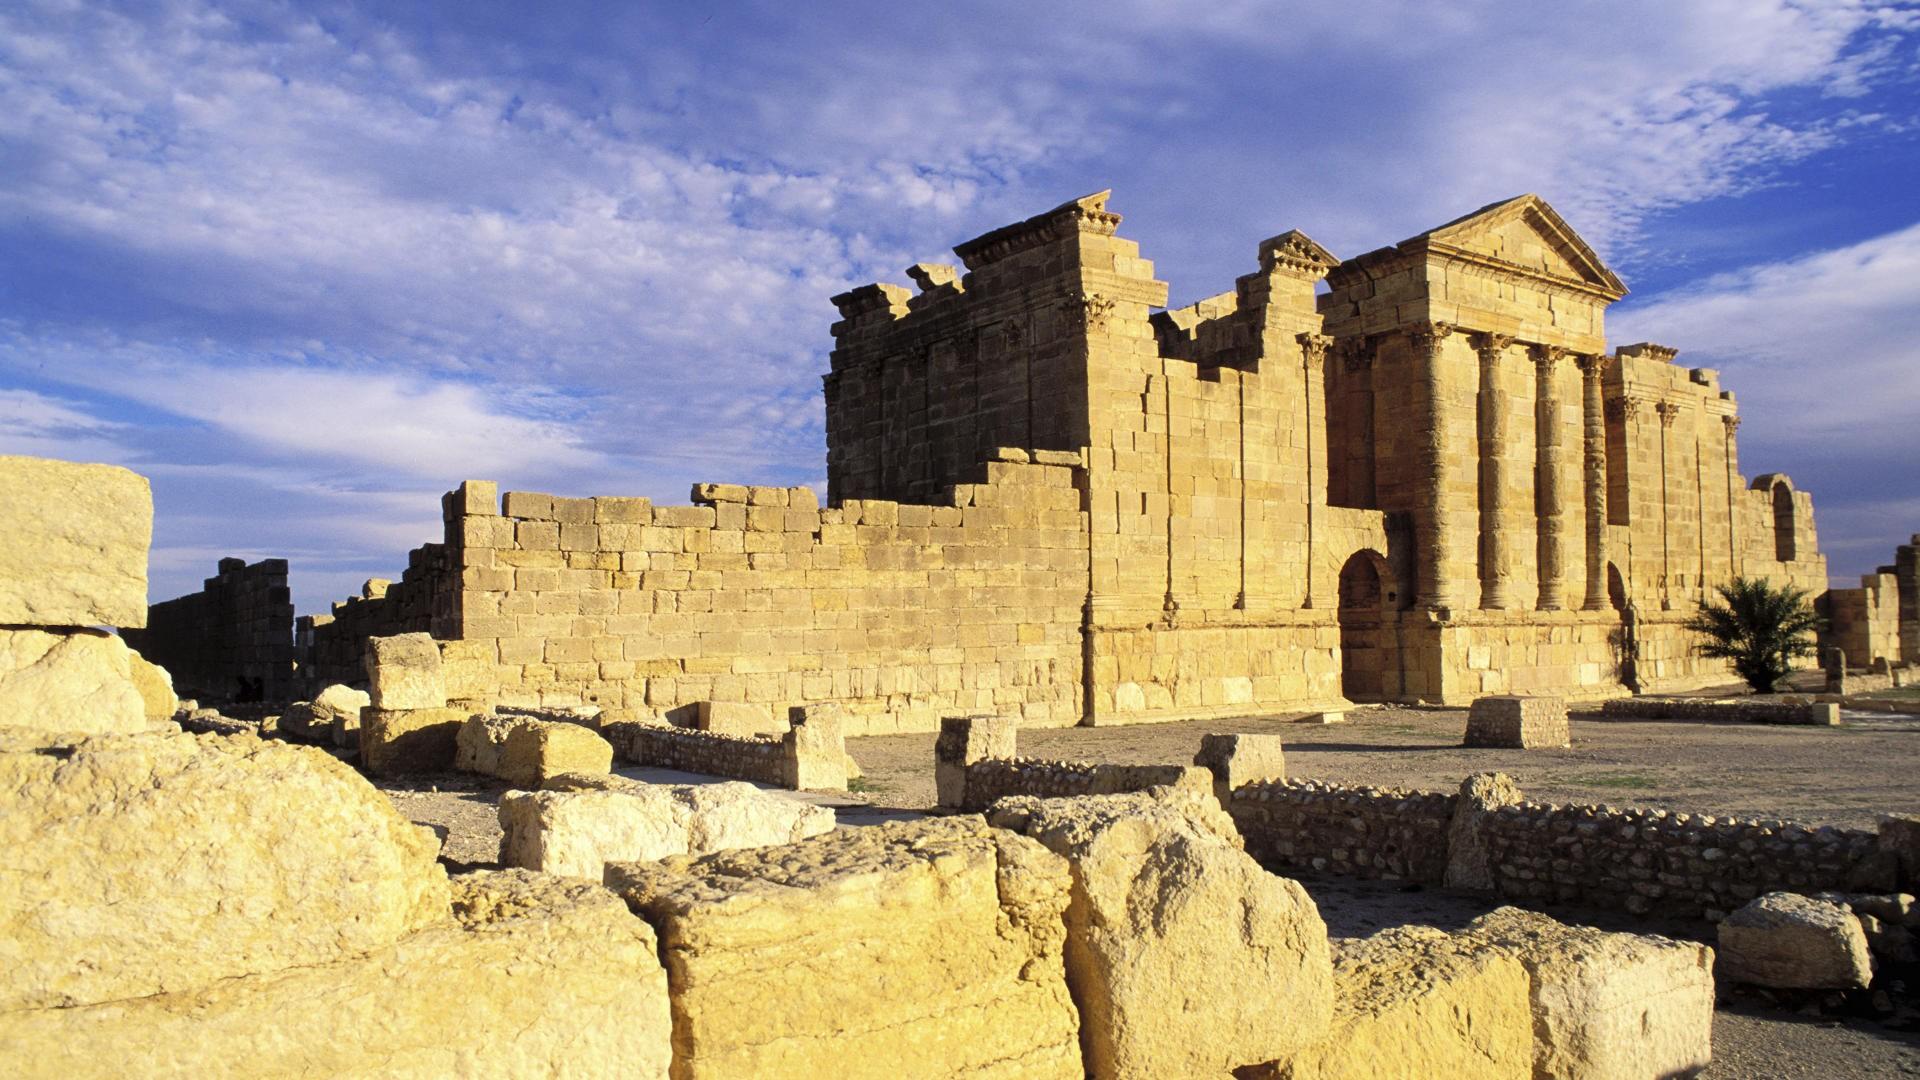 ruins-world-Jupiter-temples-Roman-x-wallpaper-wp428887